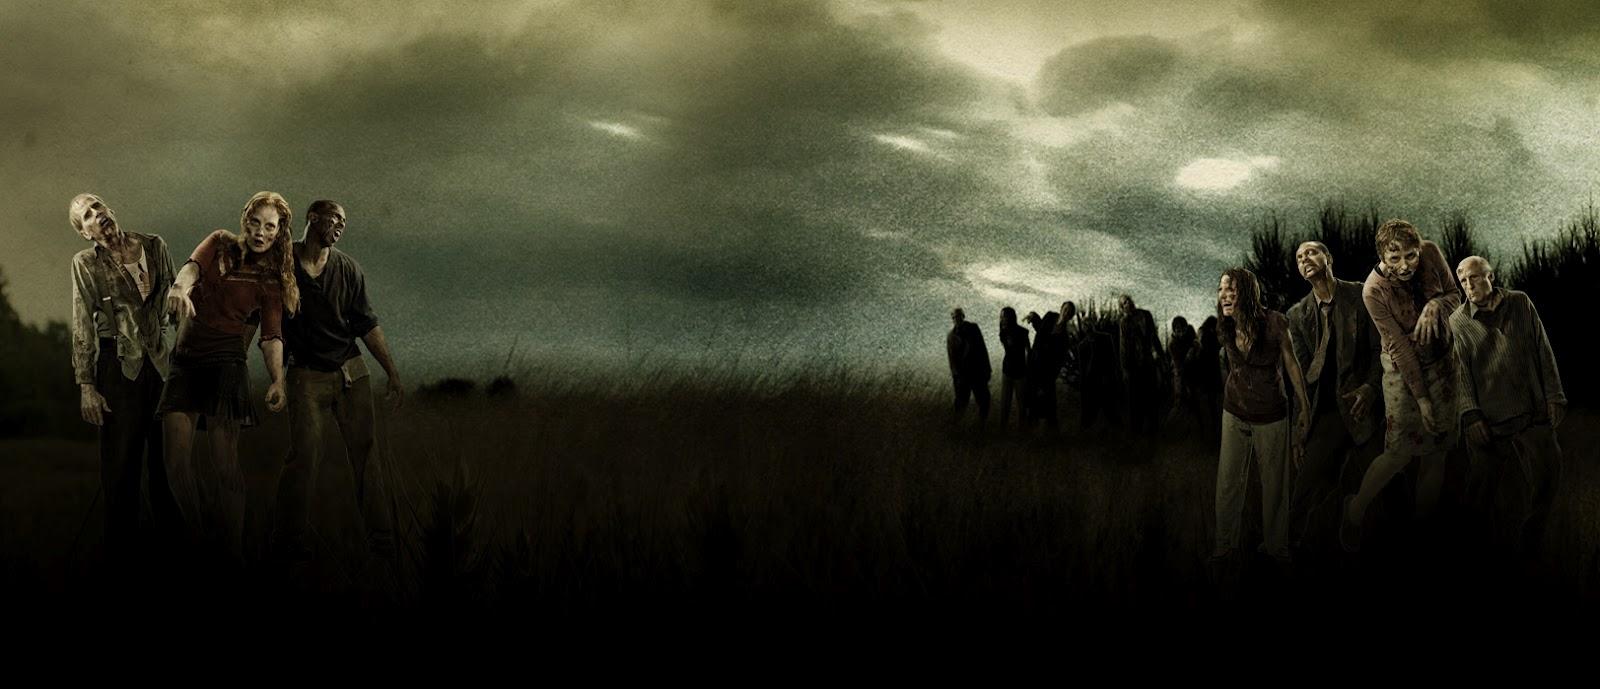 The Walking Dead Para Colorear E Imprimir